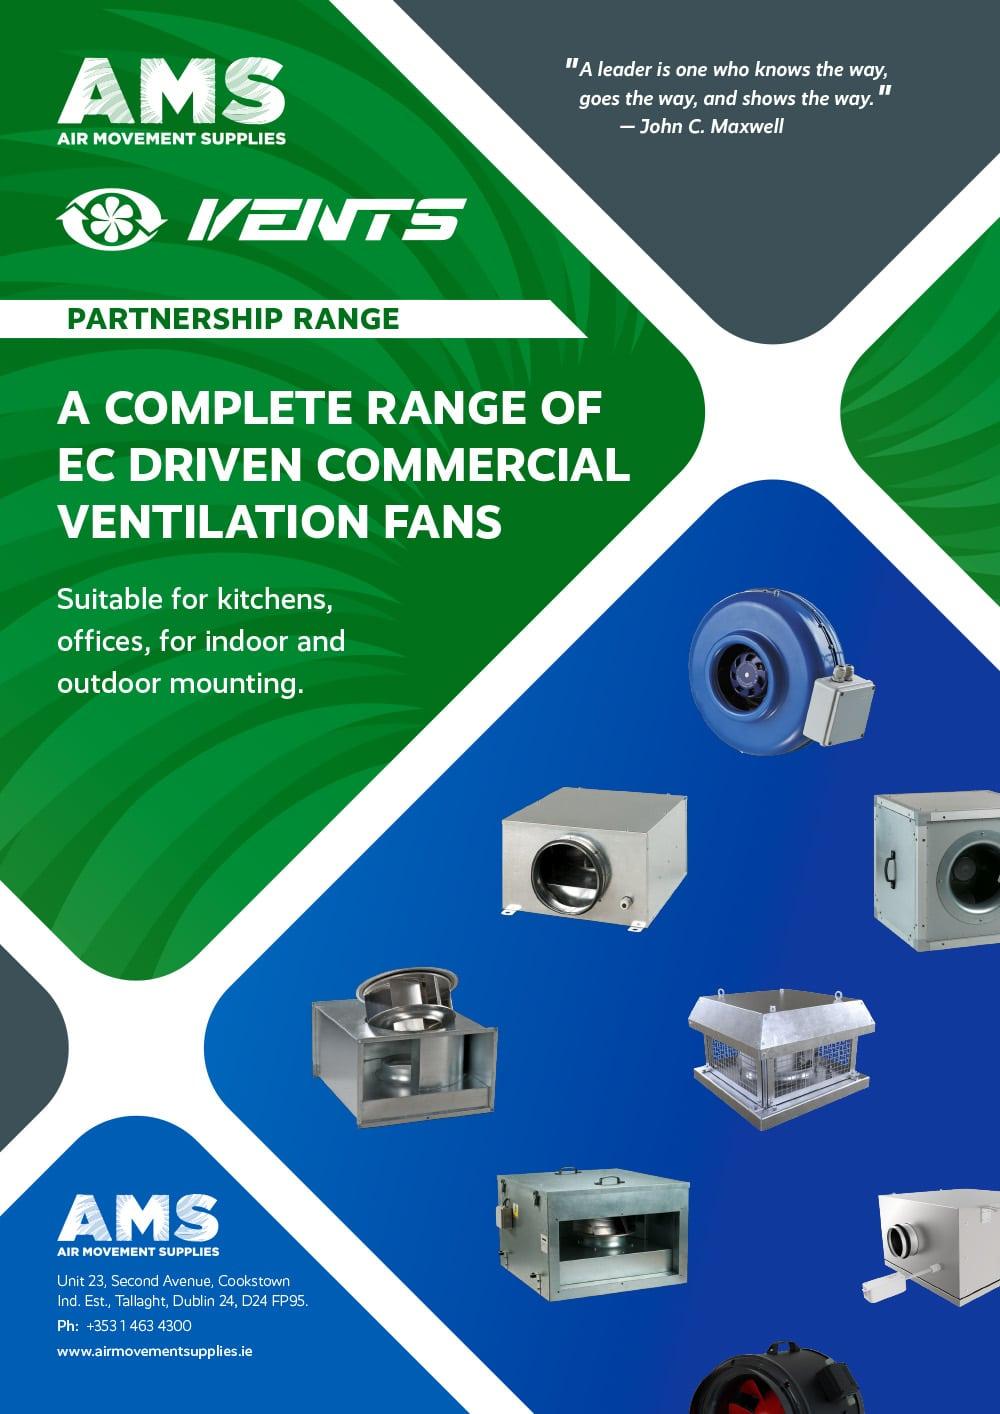 AMS Vents Partnership Range EC Commercial Ventilation